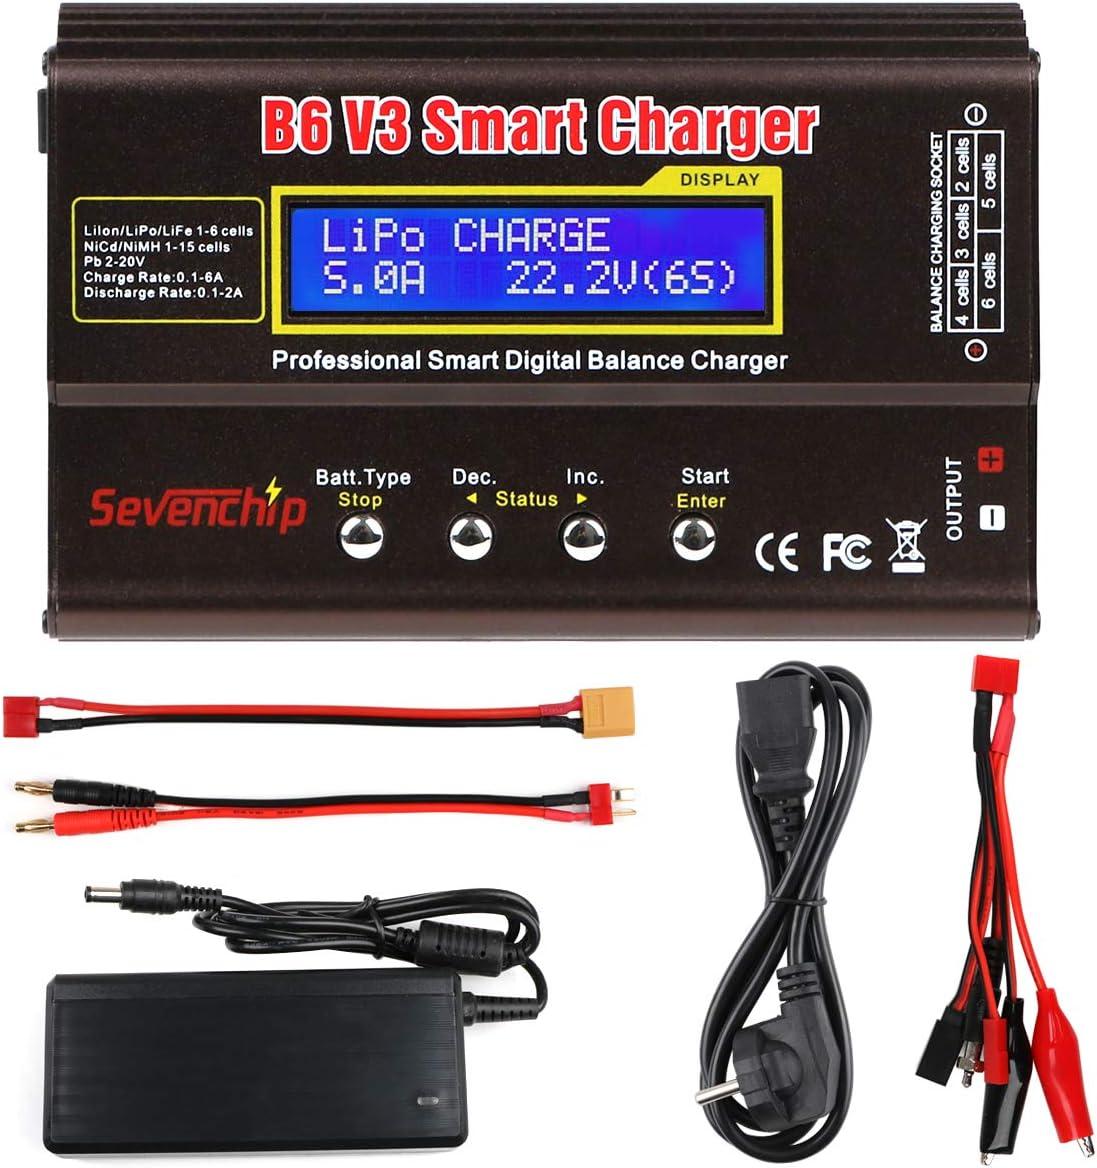 FancyWhoop B6 V3 Lipo Cargador de Batería 80W 6A RC Descargador de Batería para LiPo Li-Ion Life NiCd NiMH LiHV PB RC Hobby Cargador de Batería con Adaptador de Corriente Alterna